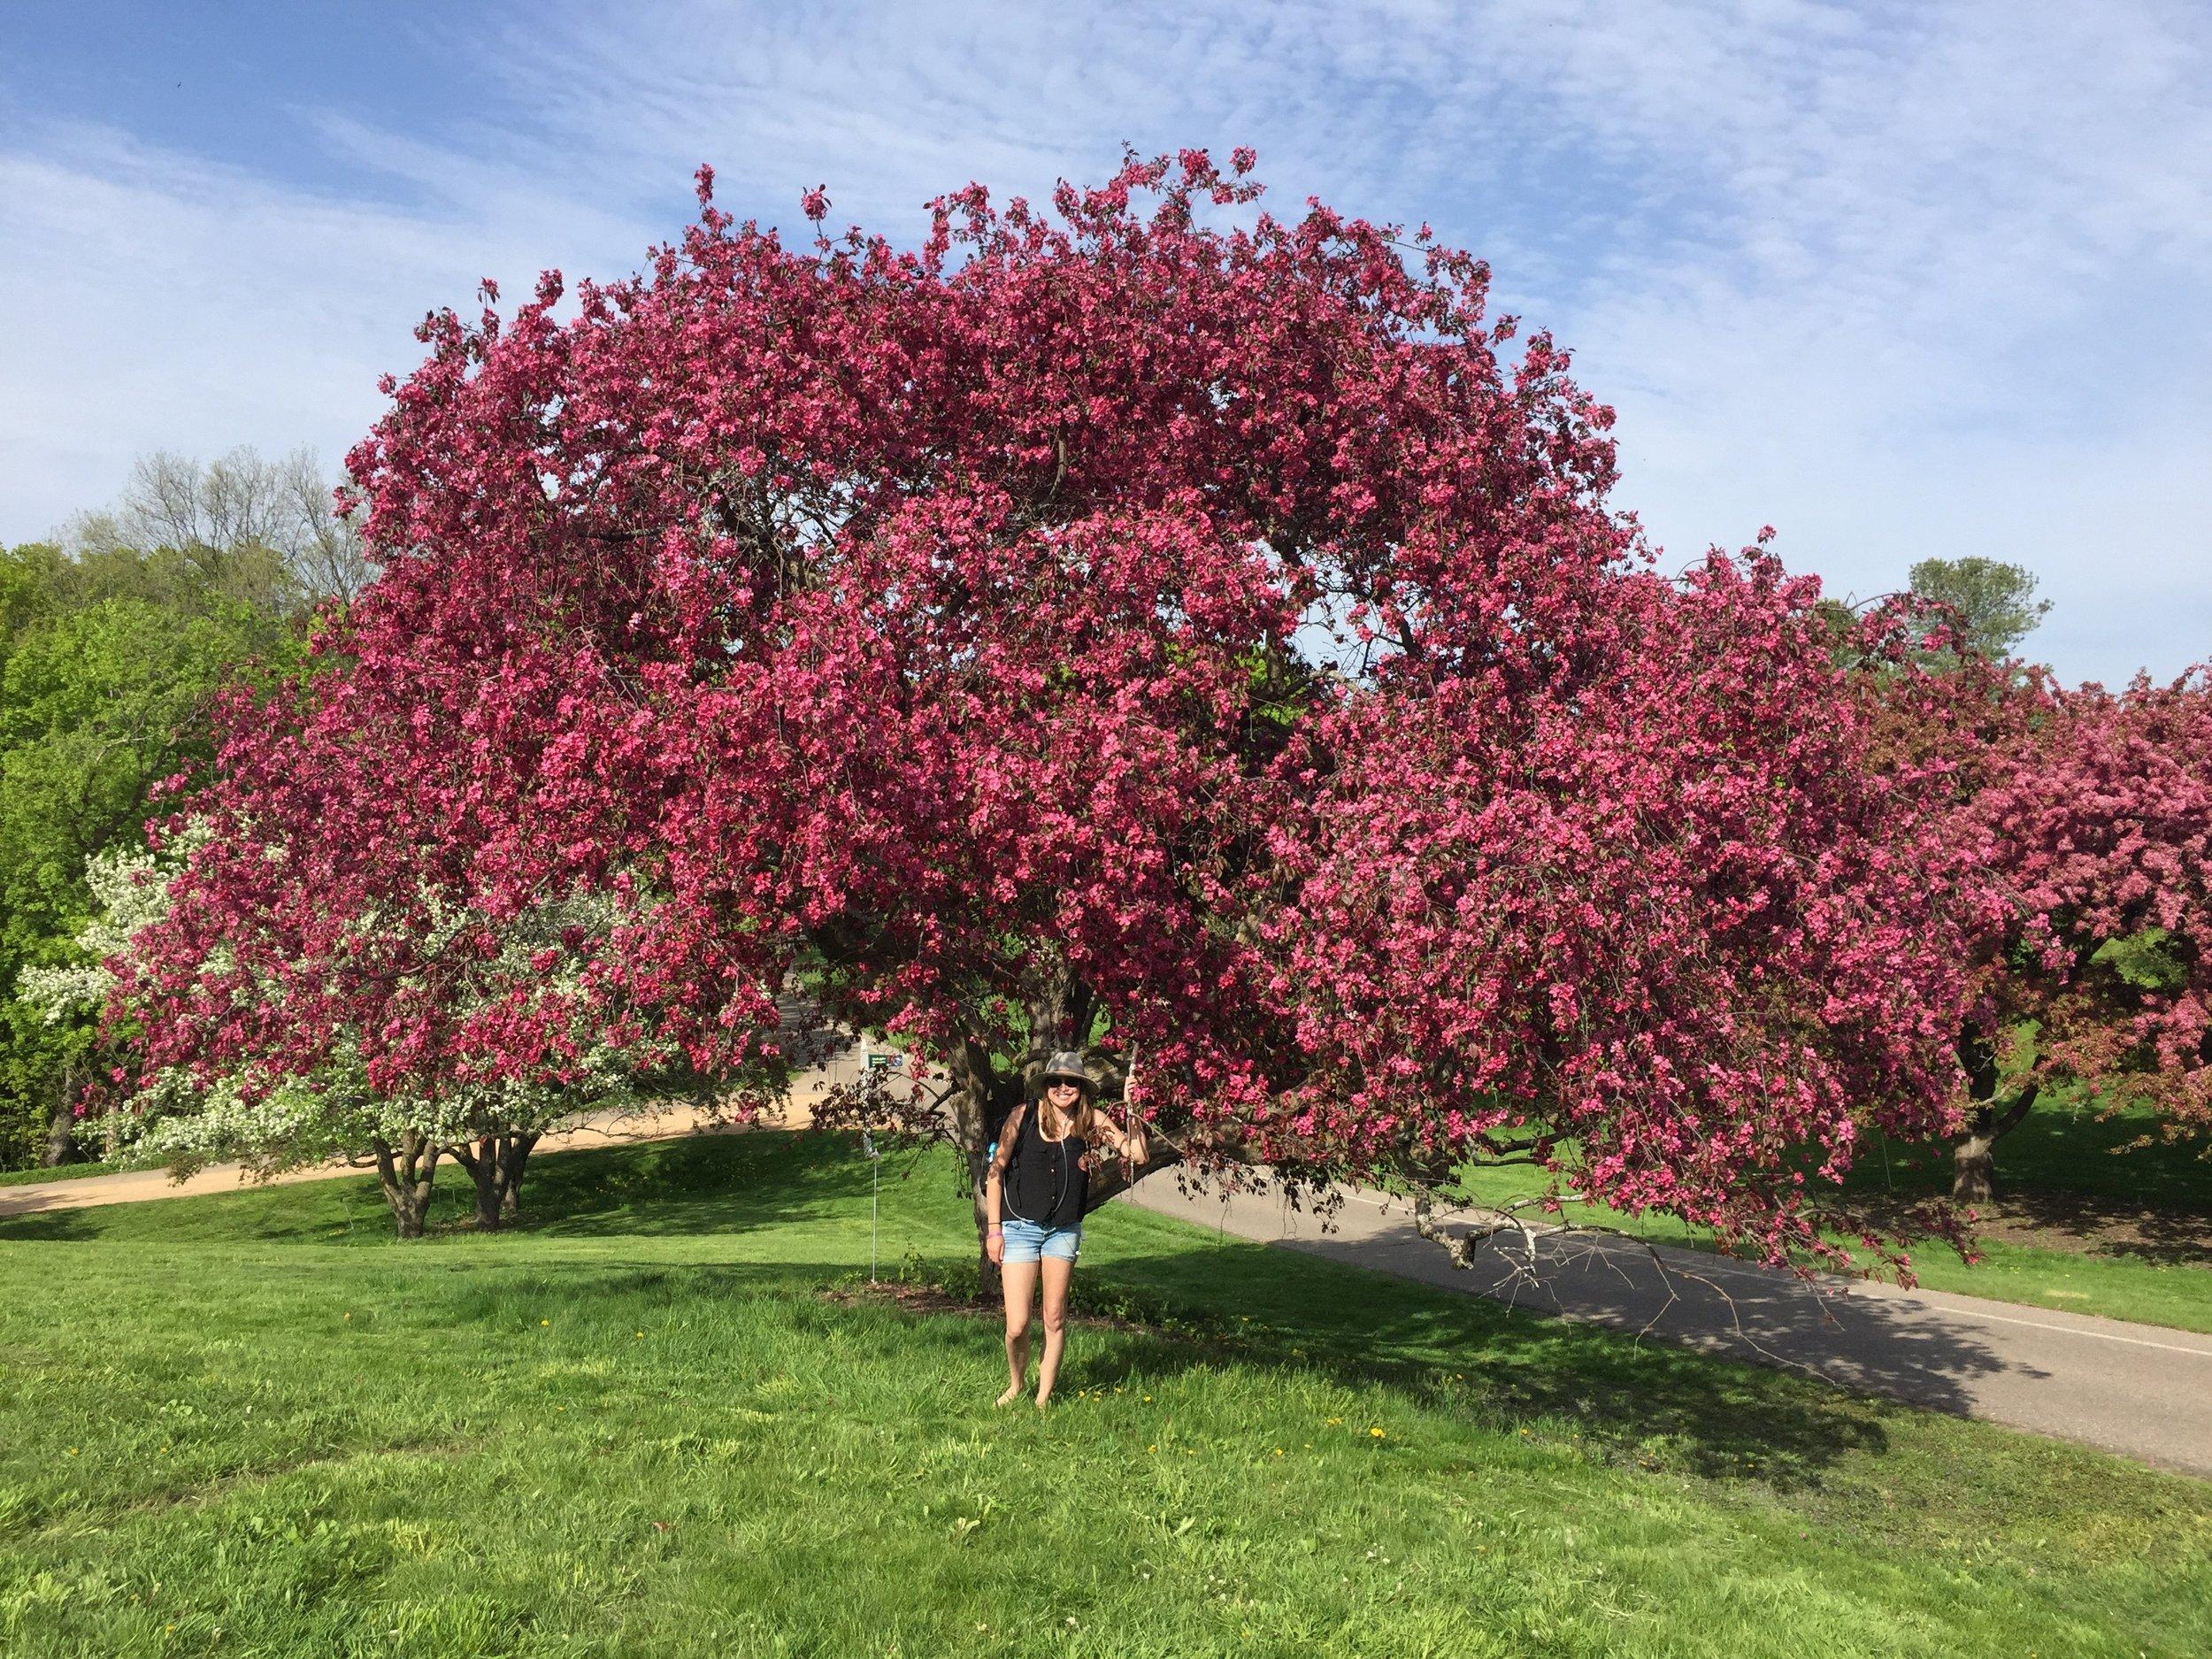 more magical trees